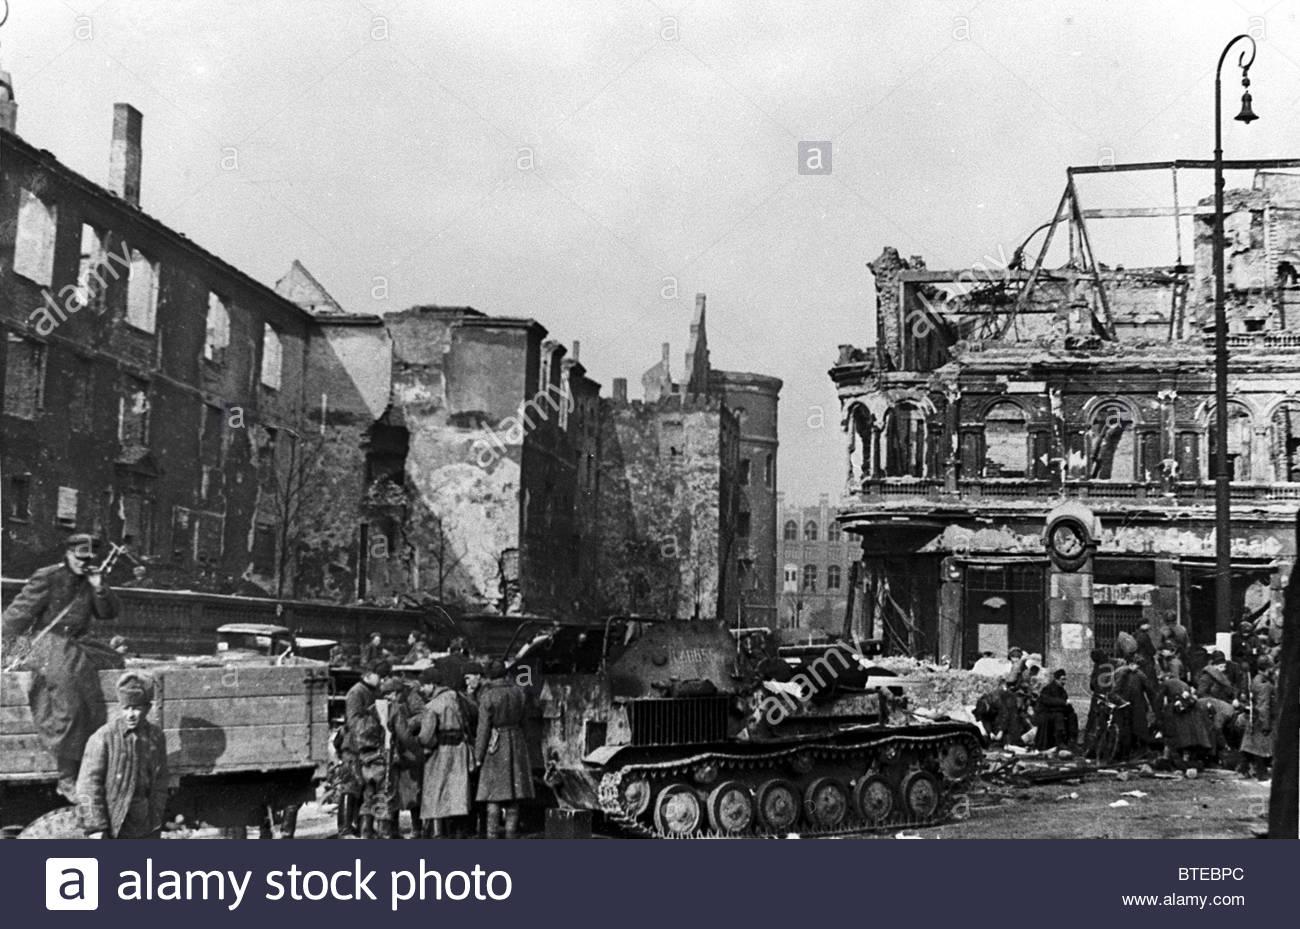 Great Patriotic War Soviet Army In Occupied Koenigsberg